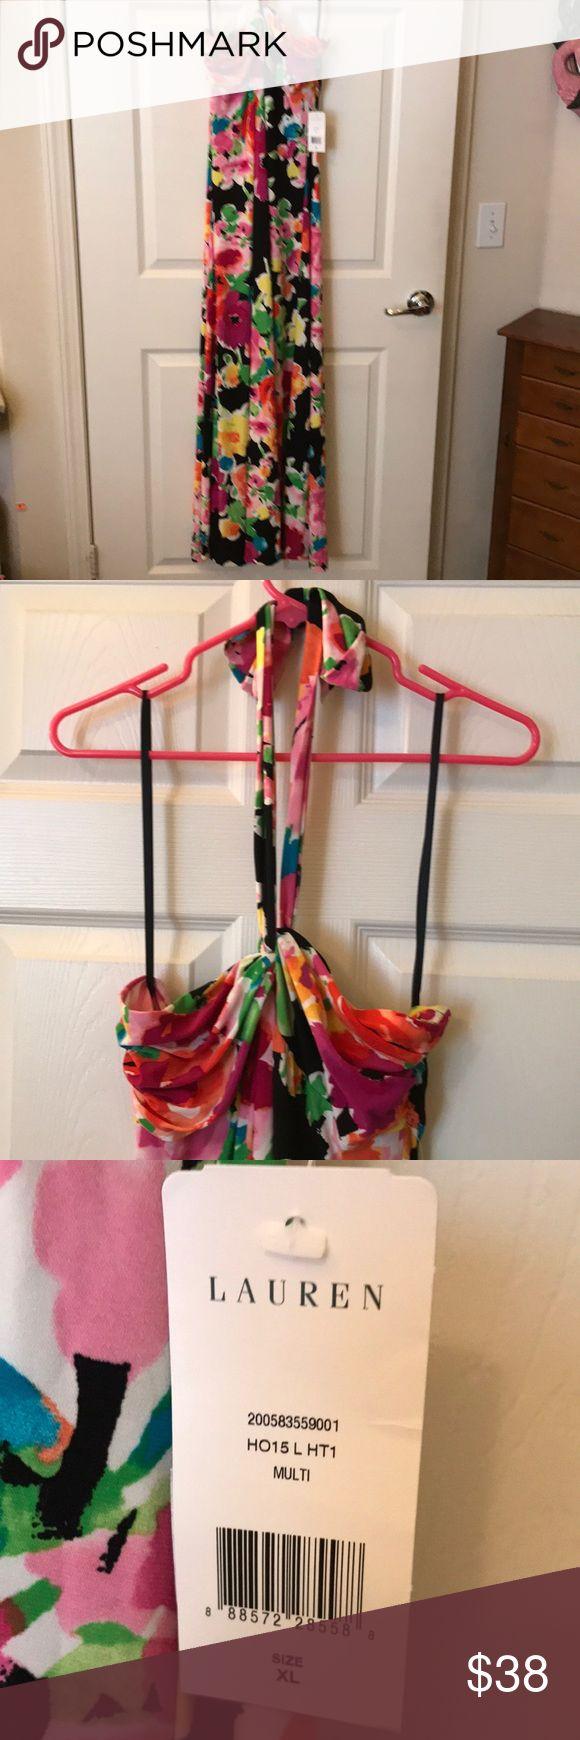 Lauren Ralph Lauren maxi dress Brand new without tags Lauren Ralph Lauren size x-large gorgeous colorful halter maxi dress. Sold out. Lauren Ralph Lauren Dresses Maxi